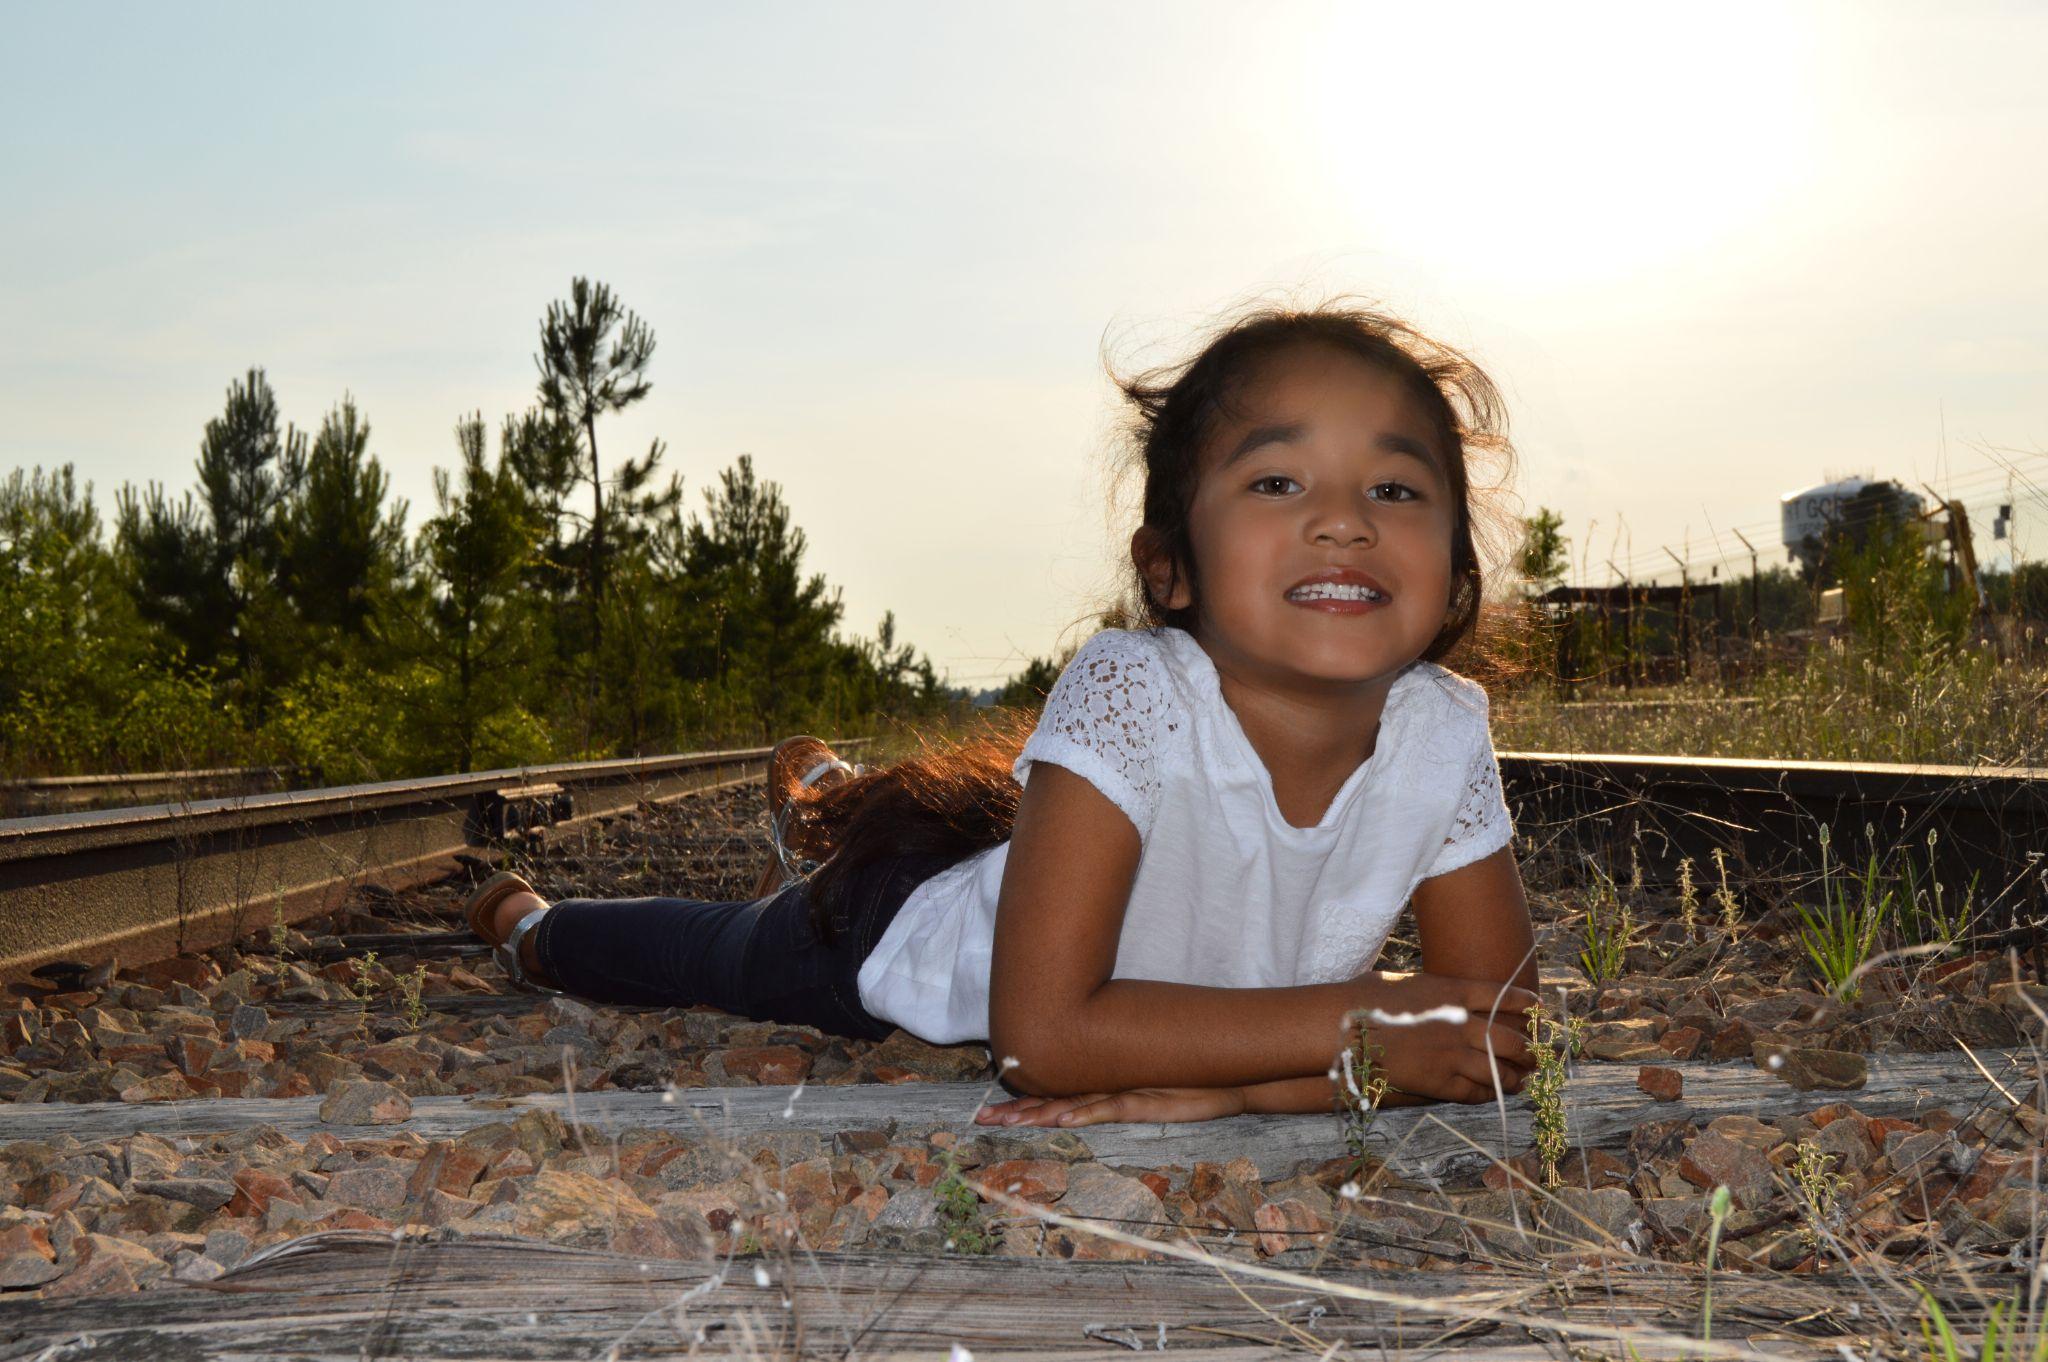 Mona Bond's Granddaughter  by michelle